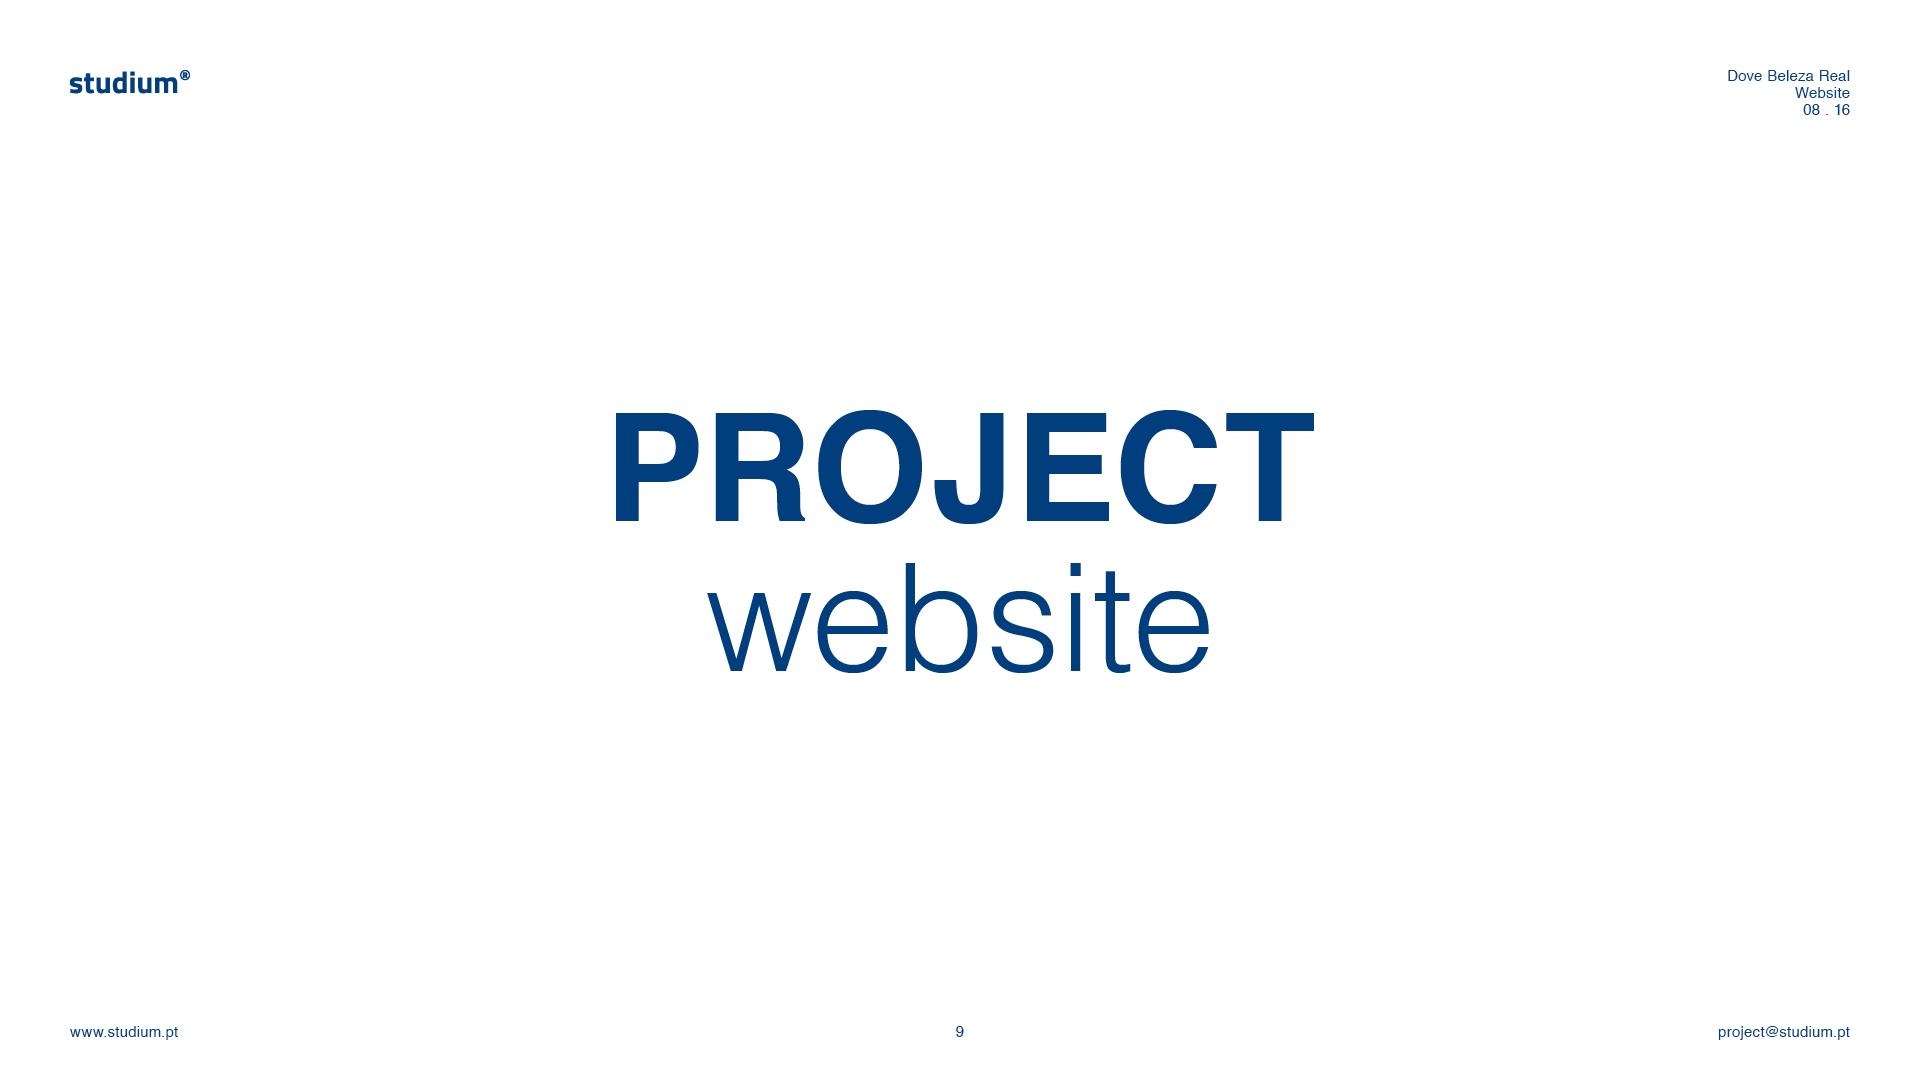 WEB20150063-DOVEBELEZAREAL-Website-Presentation-T-PU.09